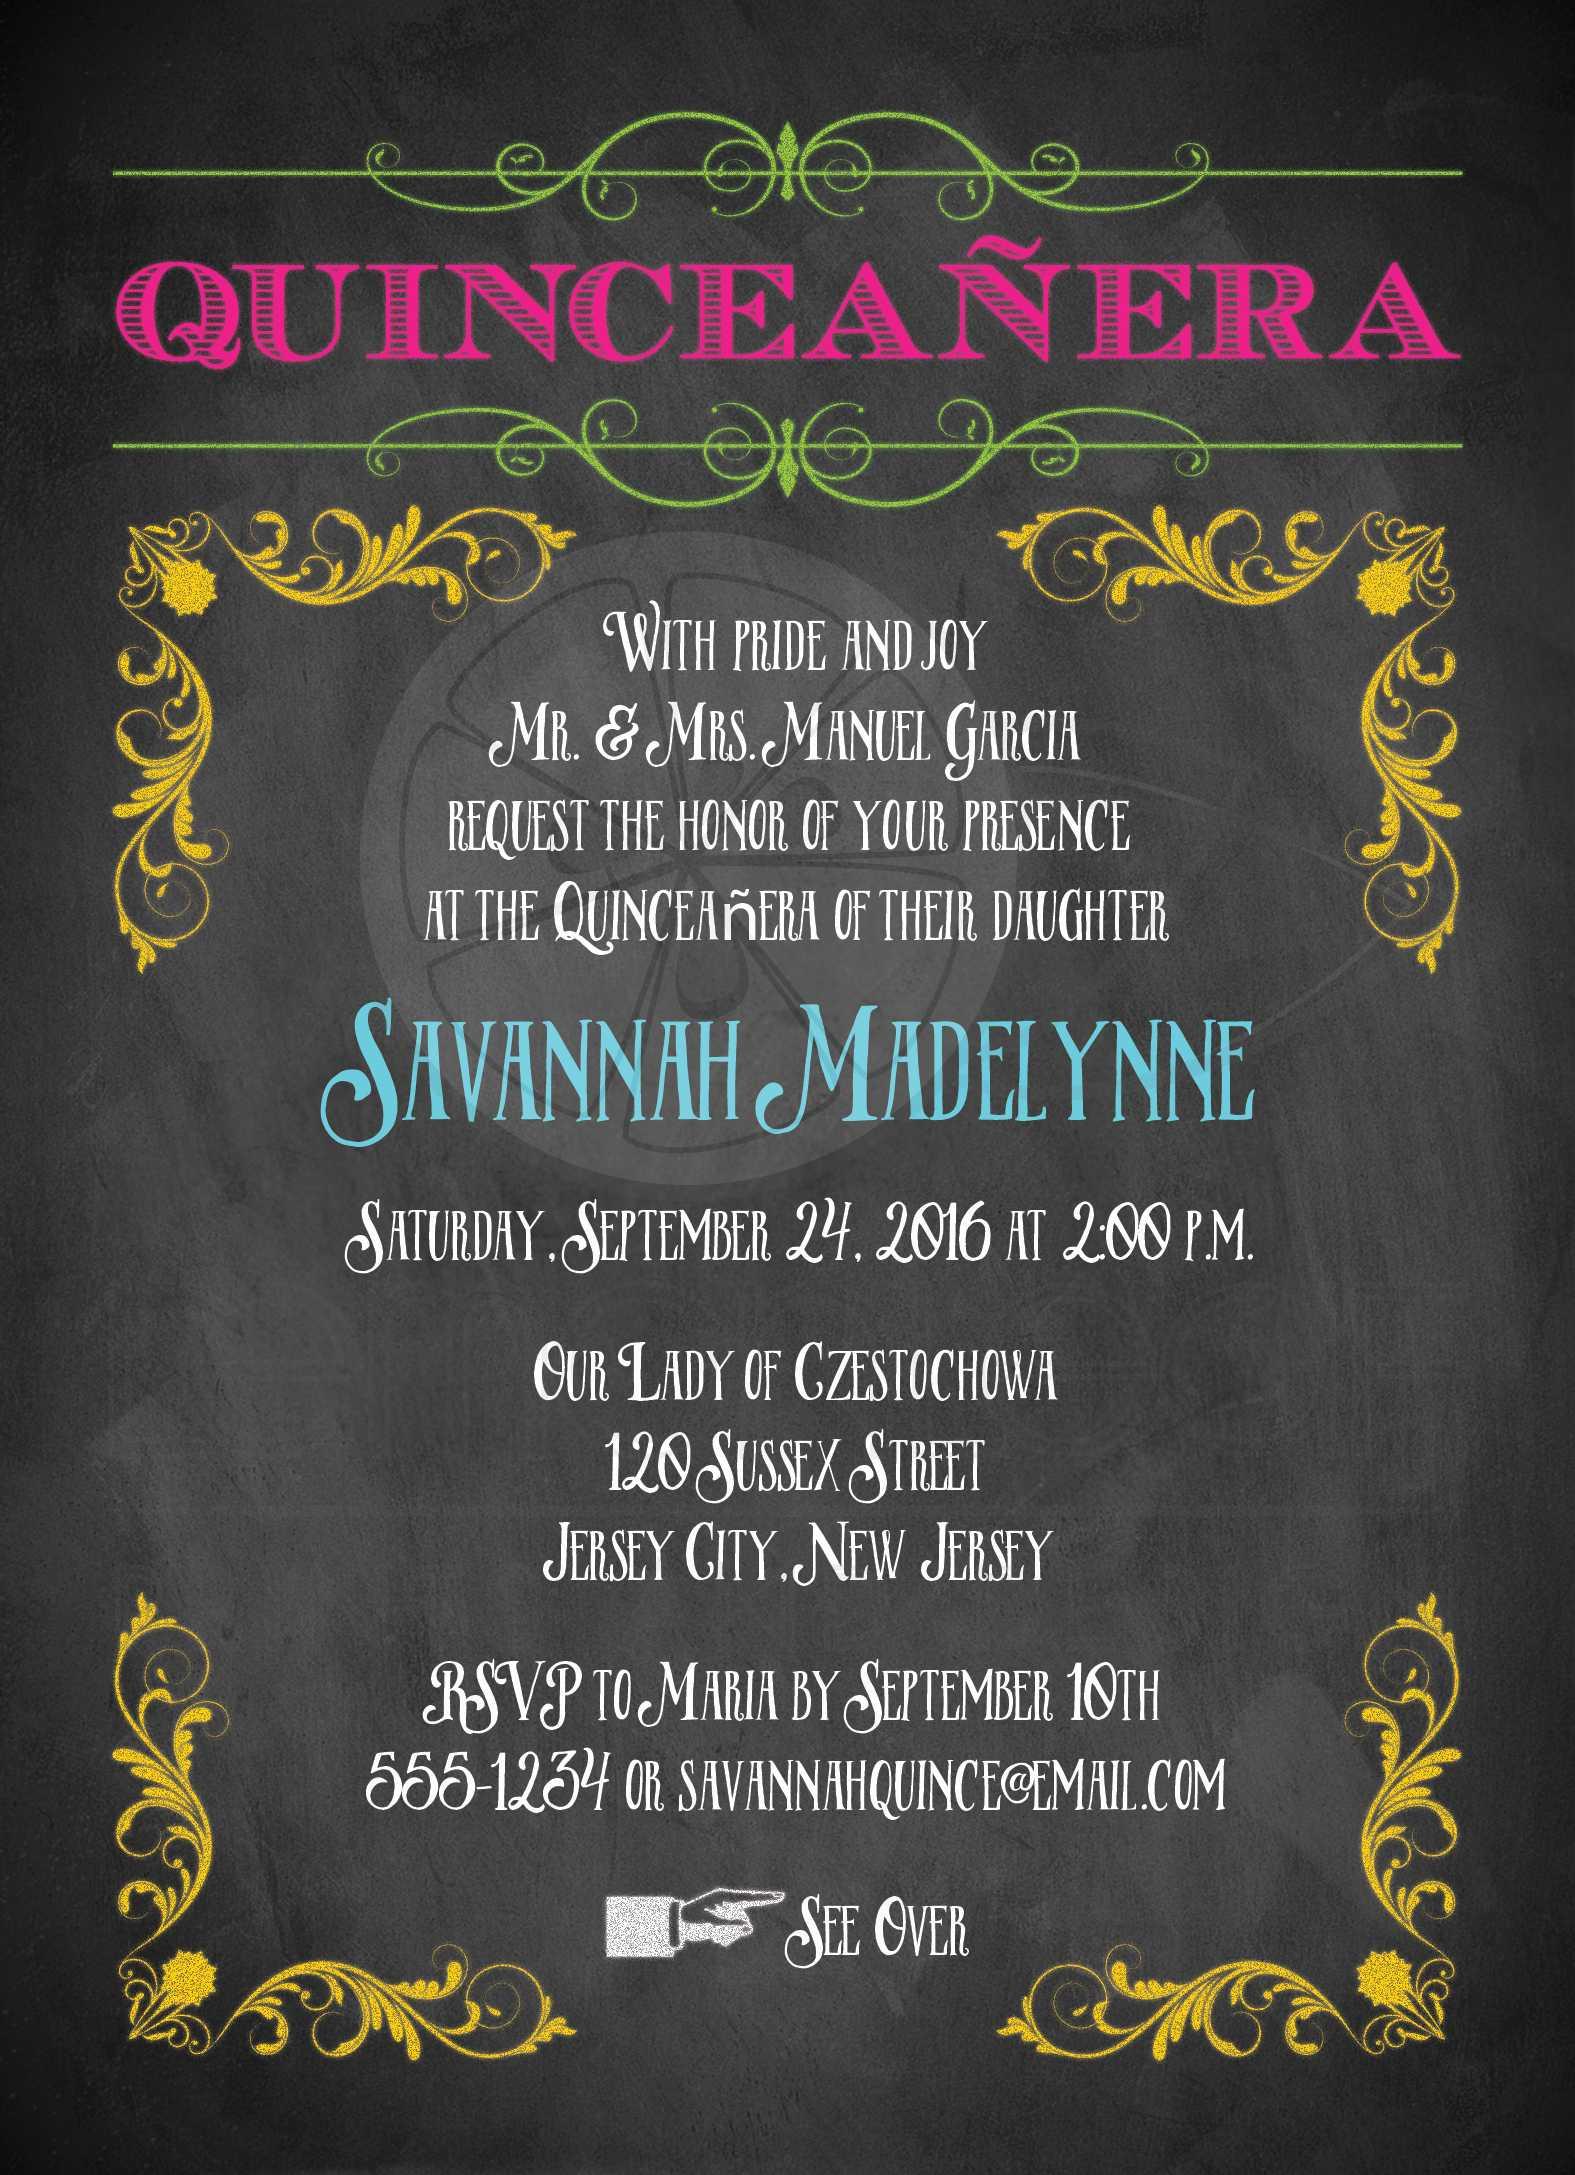 quinceanera invitation neon chalkboard vintage scrolls and flourishes